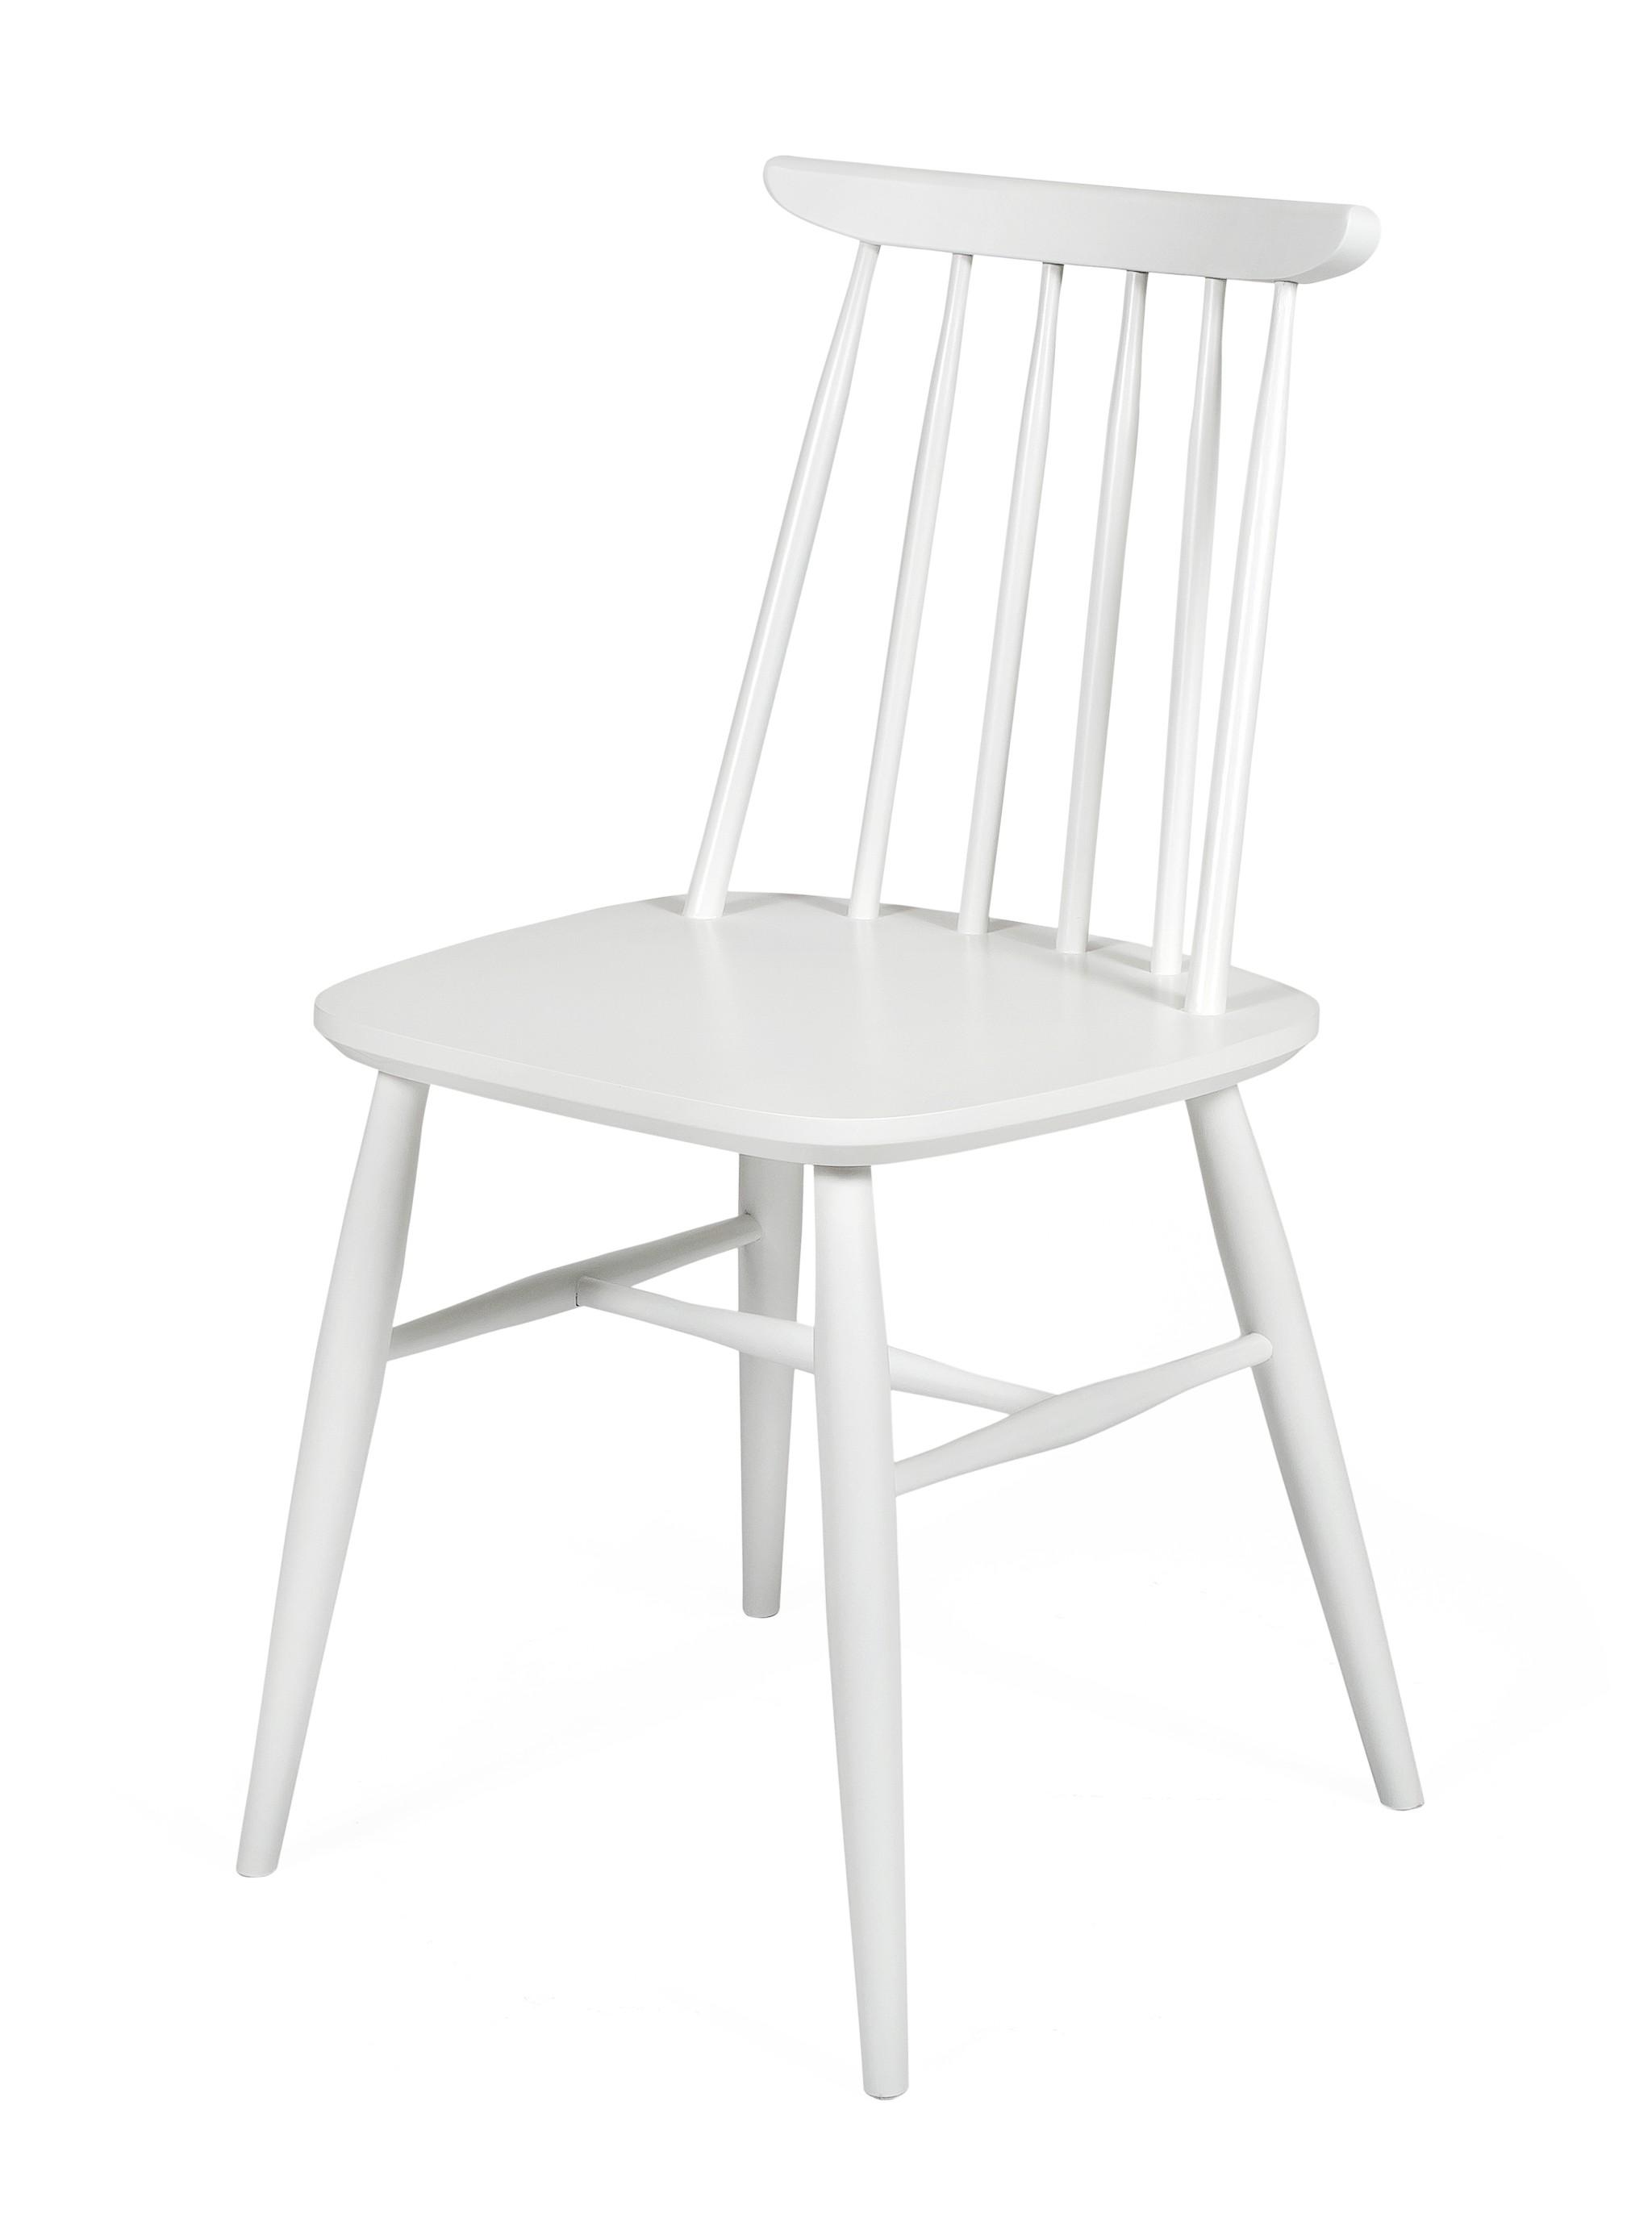 2x Esszimmerstuhl AV Birke massiv Holz Stuhl Stühle Küchenstuhl weiß    dynamic-24.de